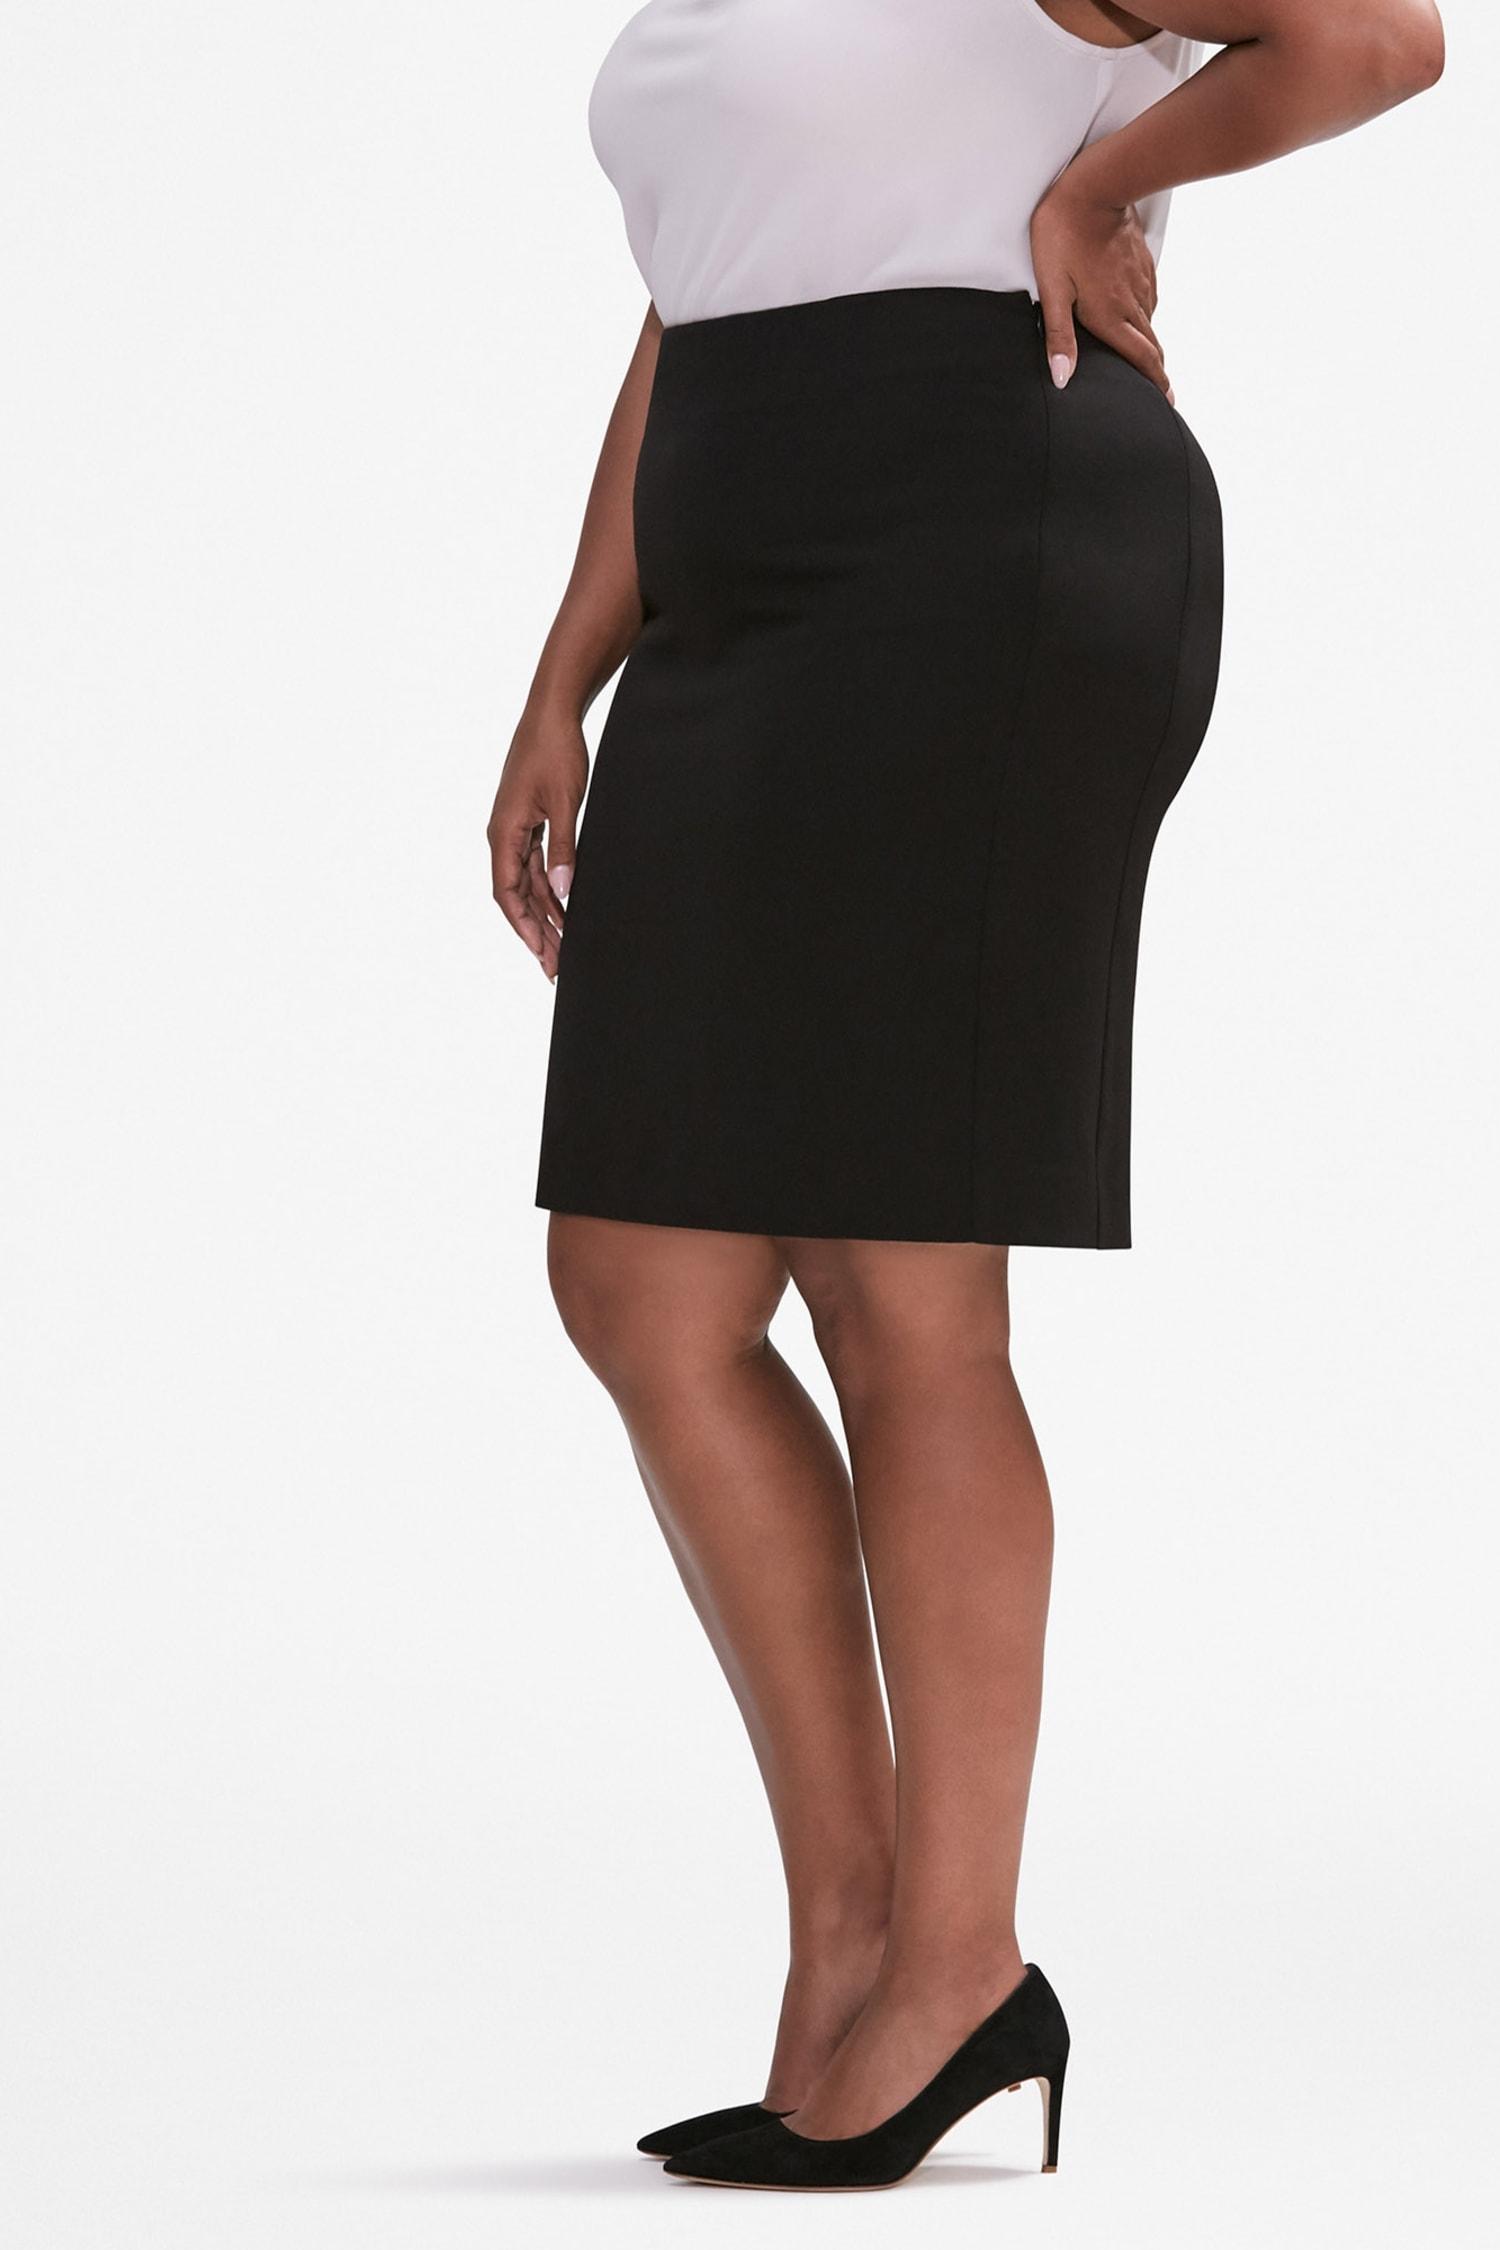 1f978aeb14 Noho Skirt - Black | MM.LaFleur